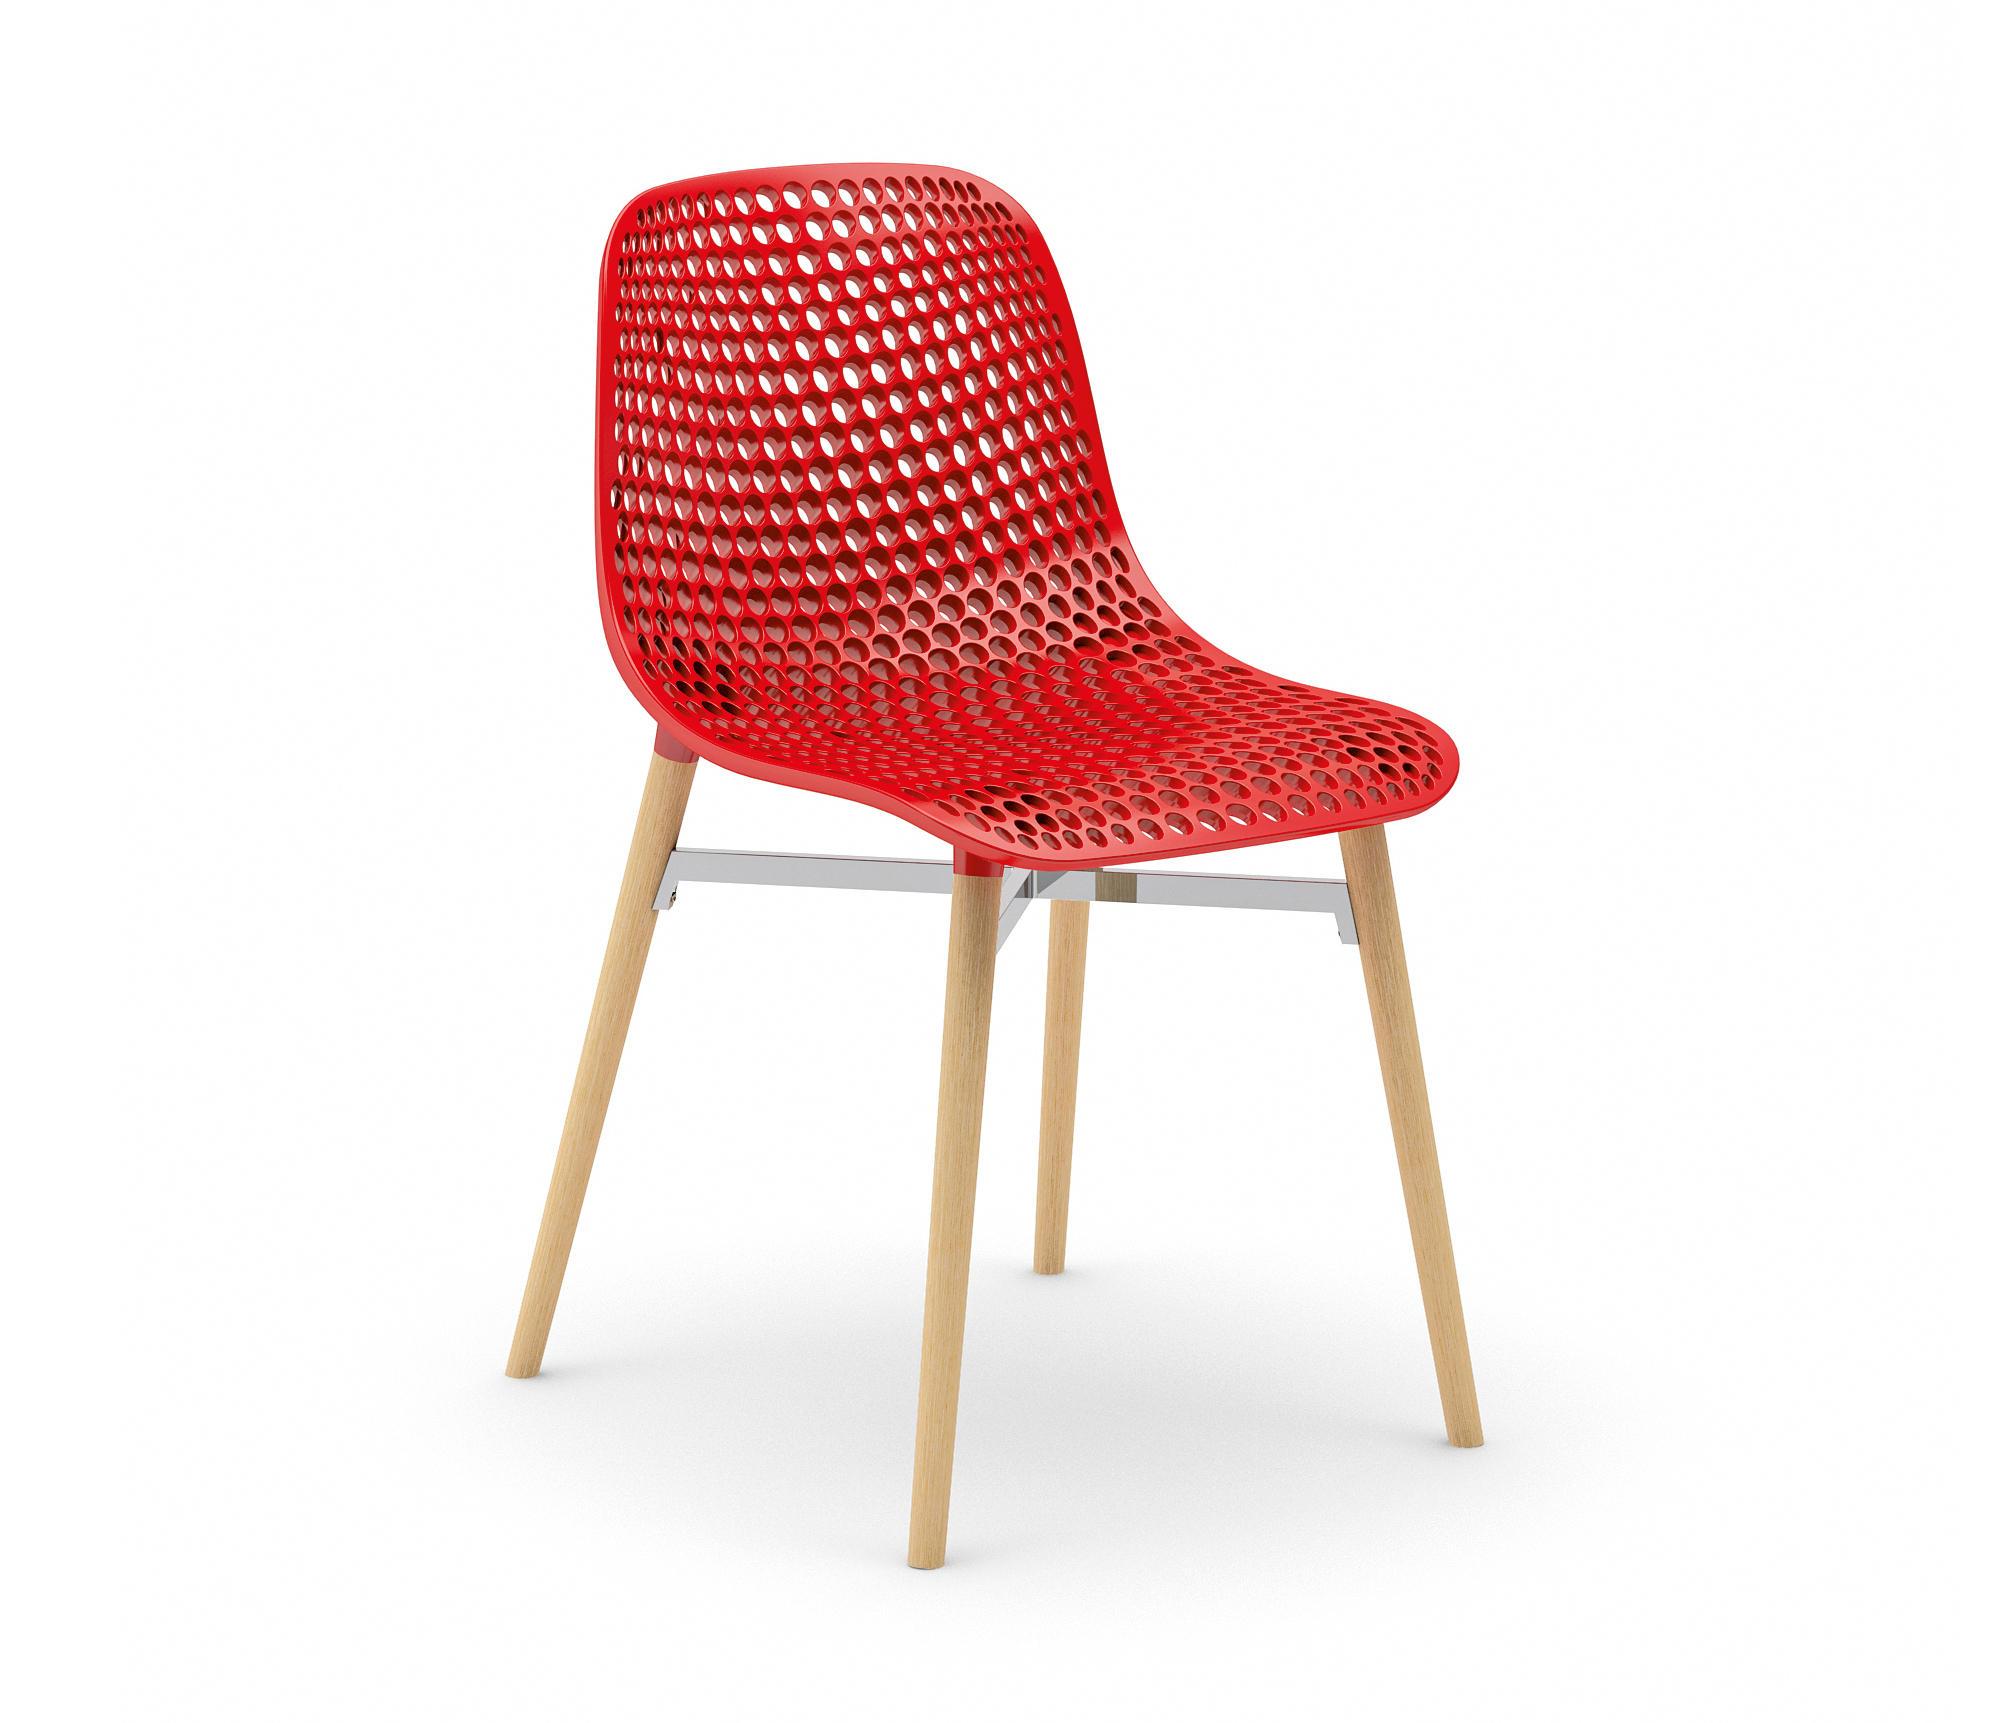 Next Chairs From Infiniti Design Architonic